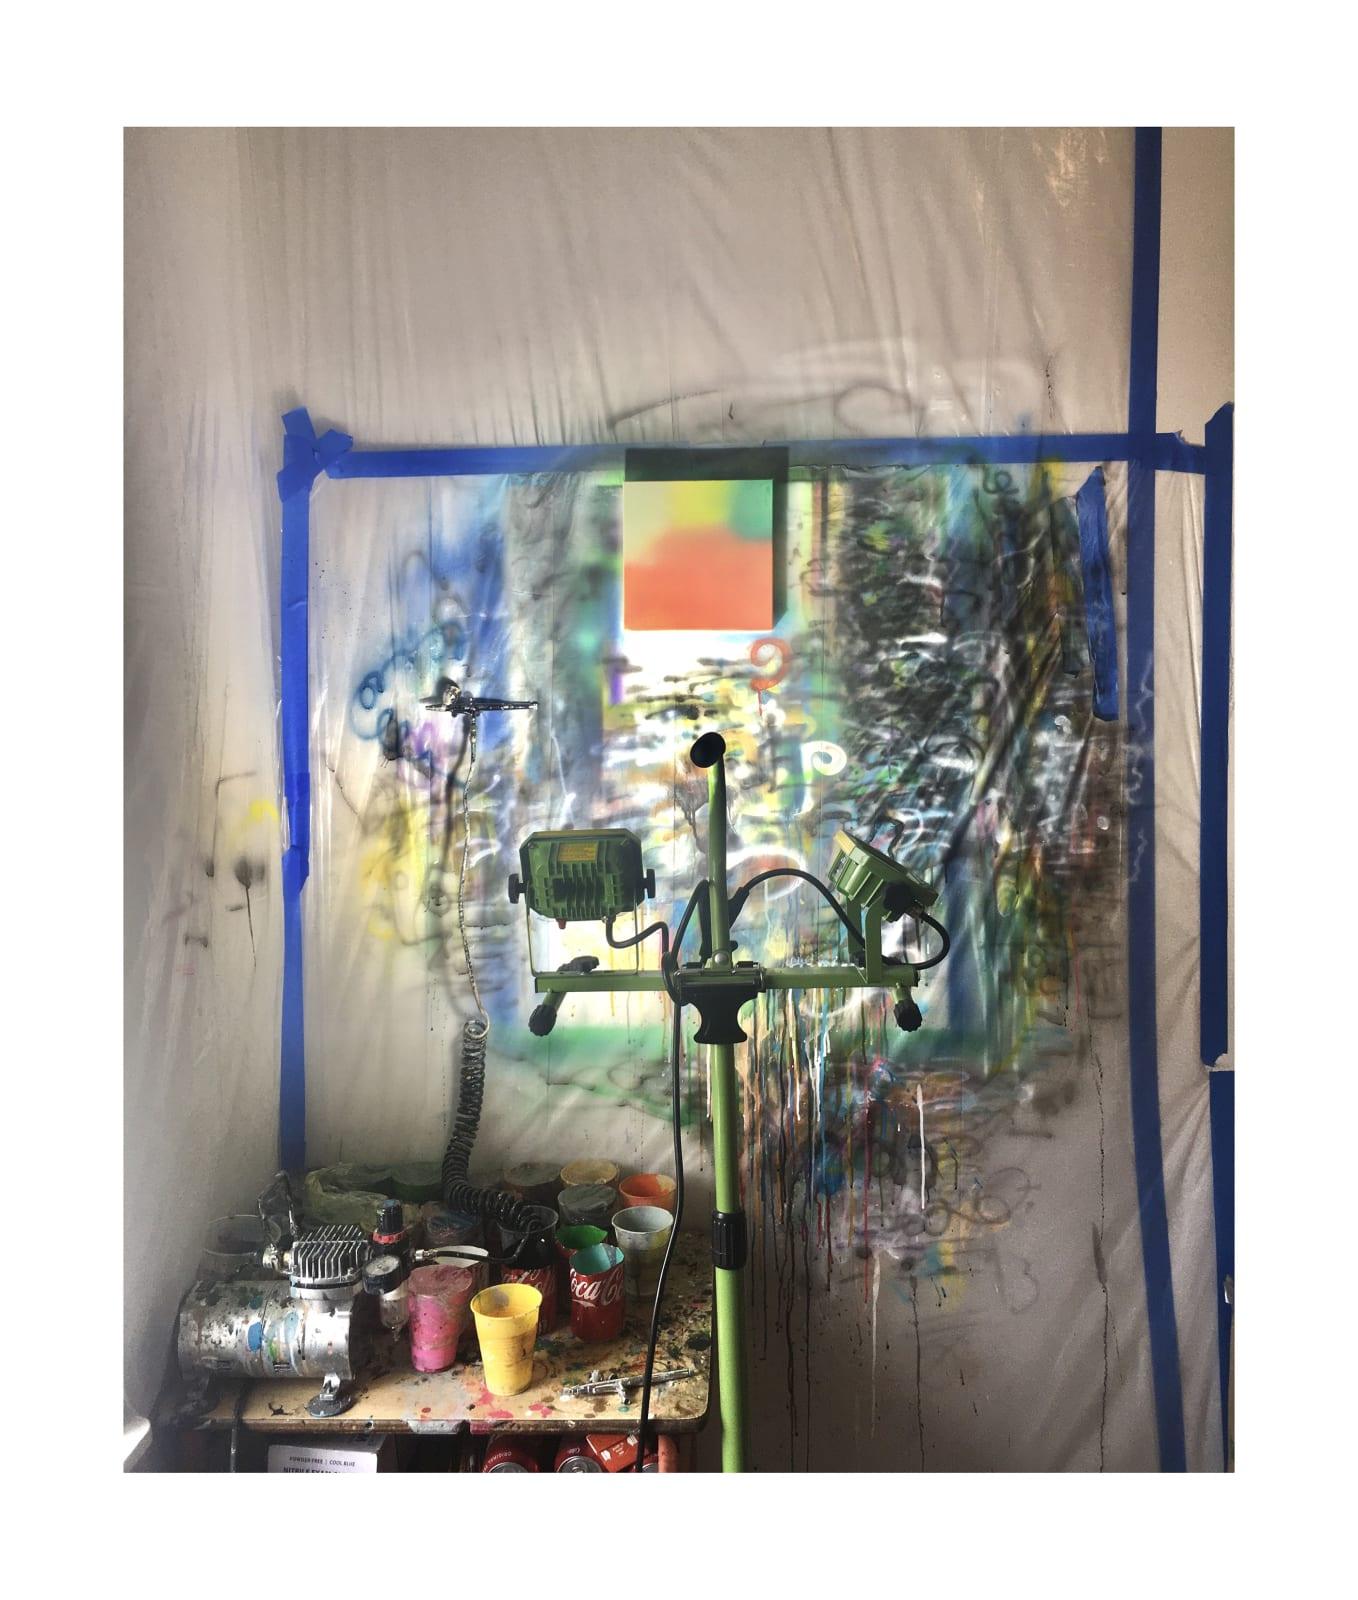 Siyuan Tan Home Studio, Brooklyn, NY, USA